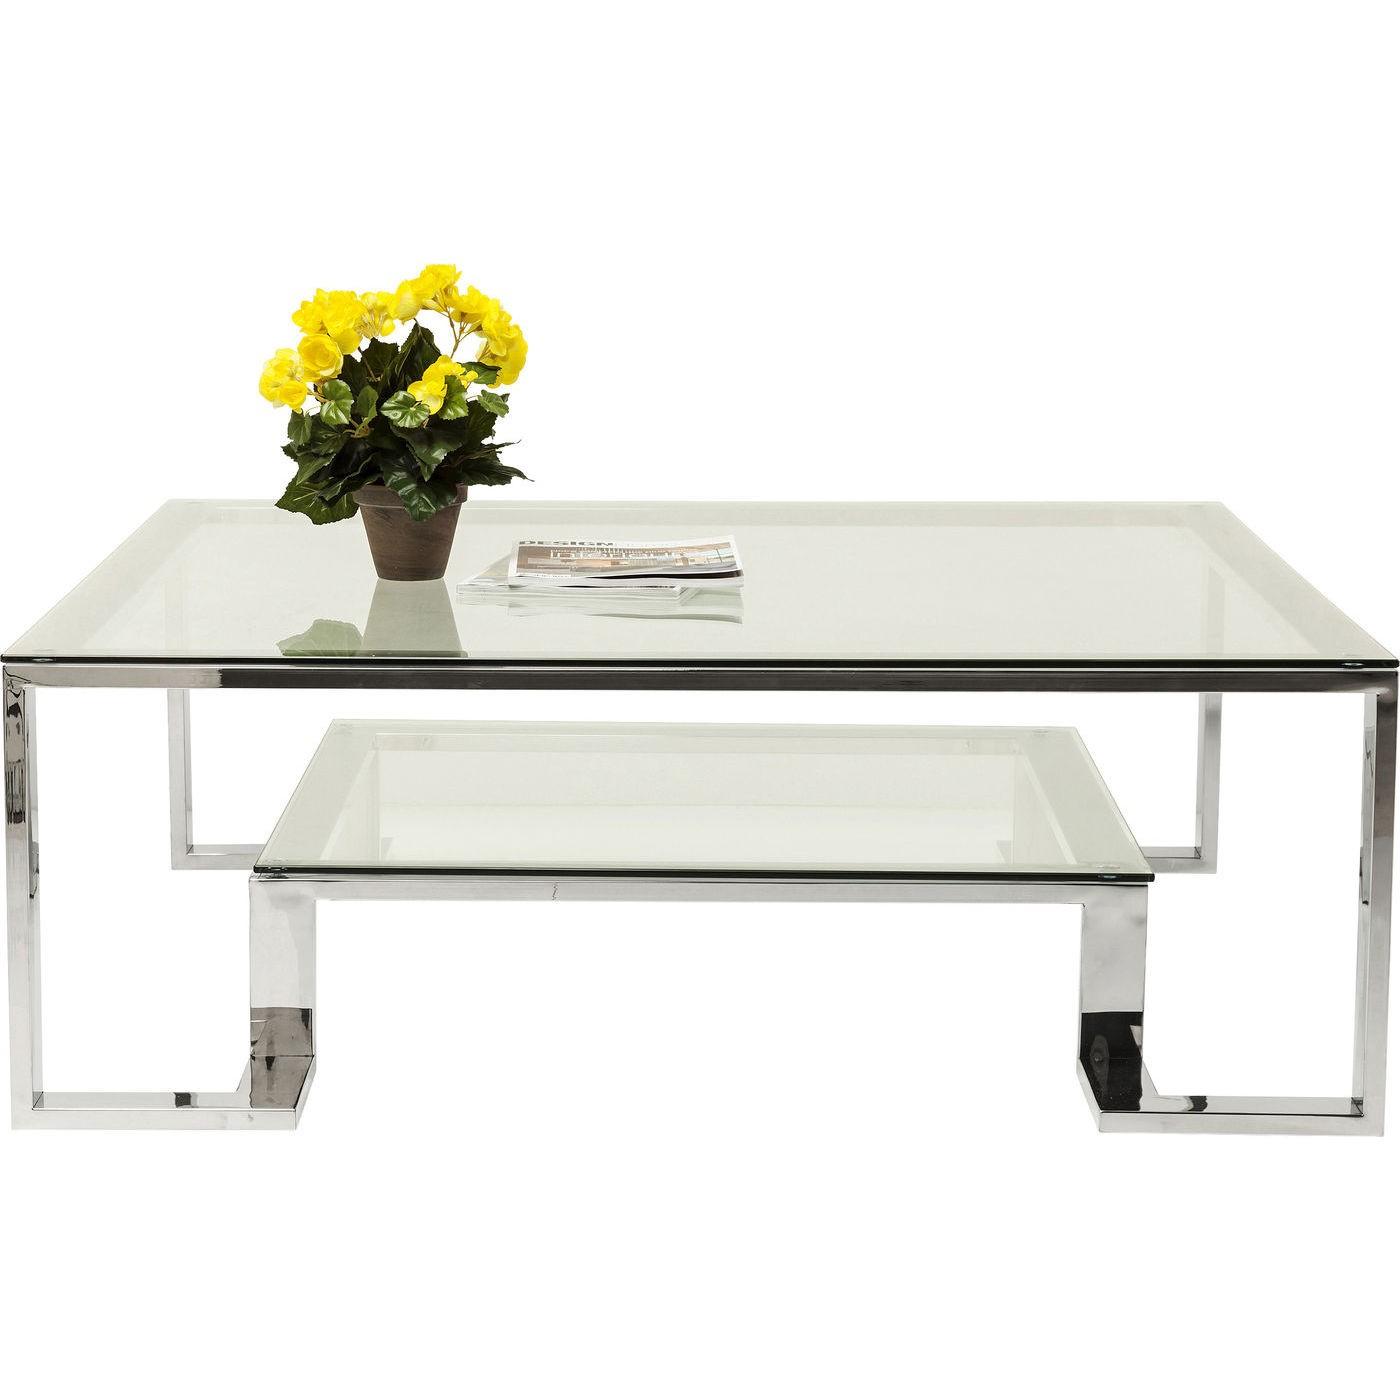 KARE DESIGN Sofabord, Silver Rush 120x120cm